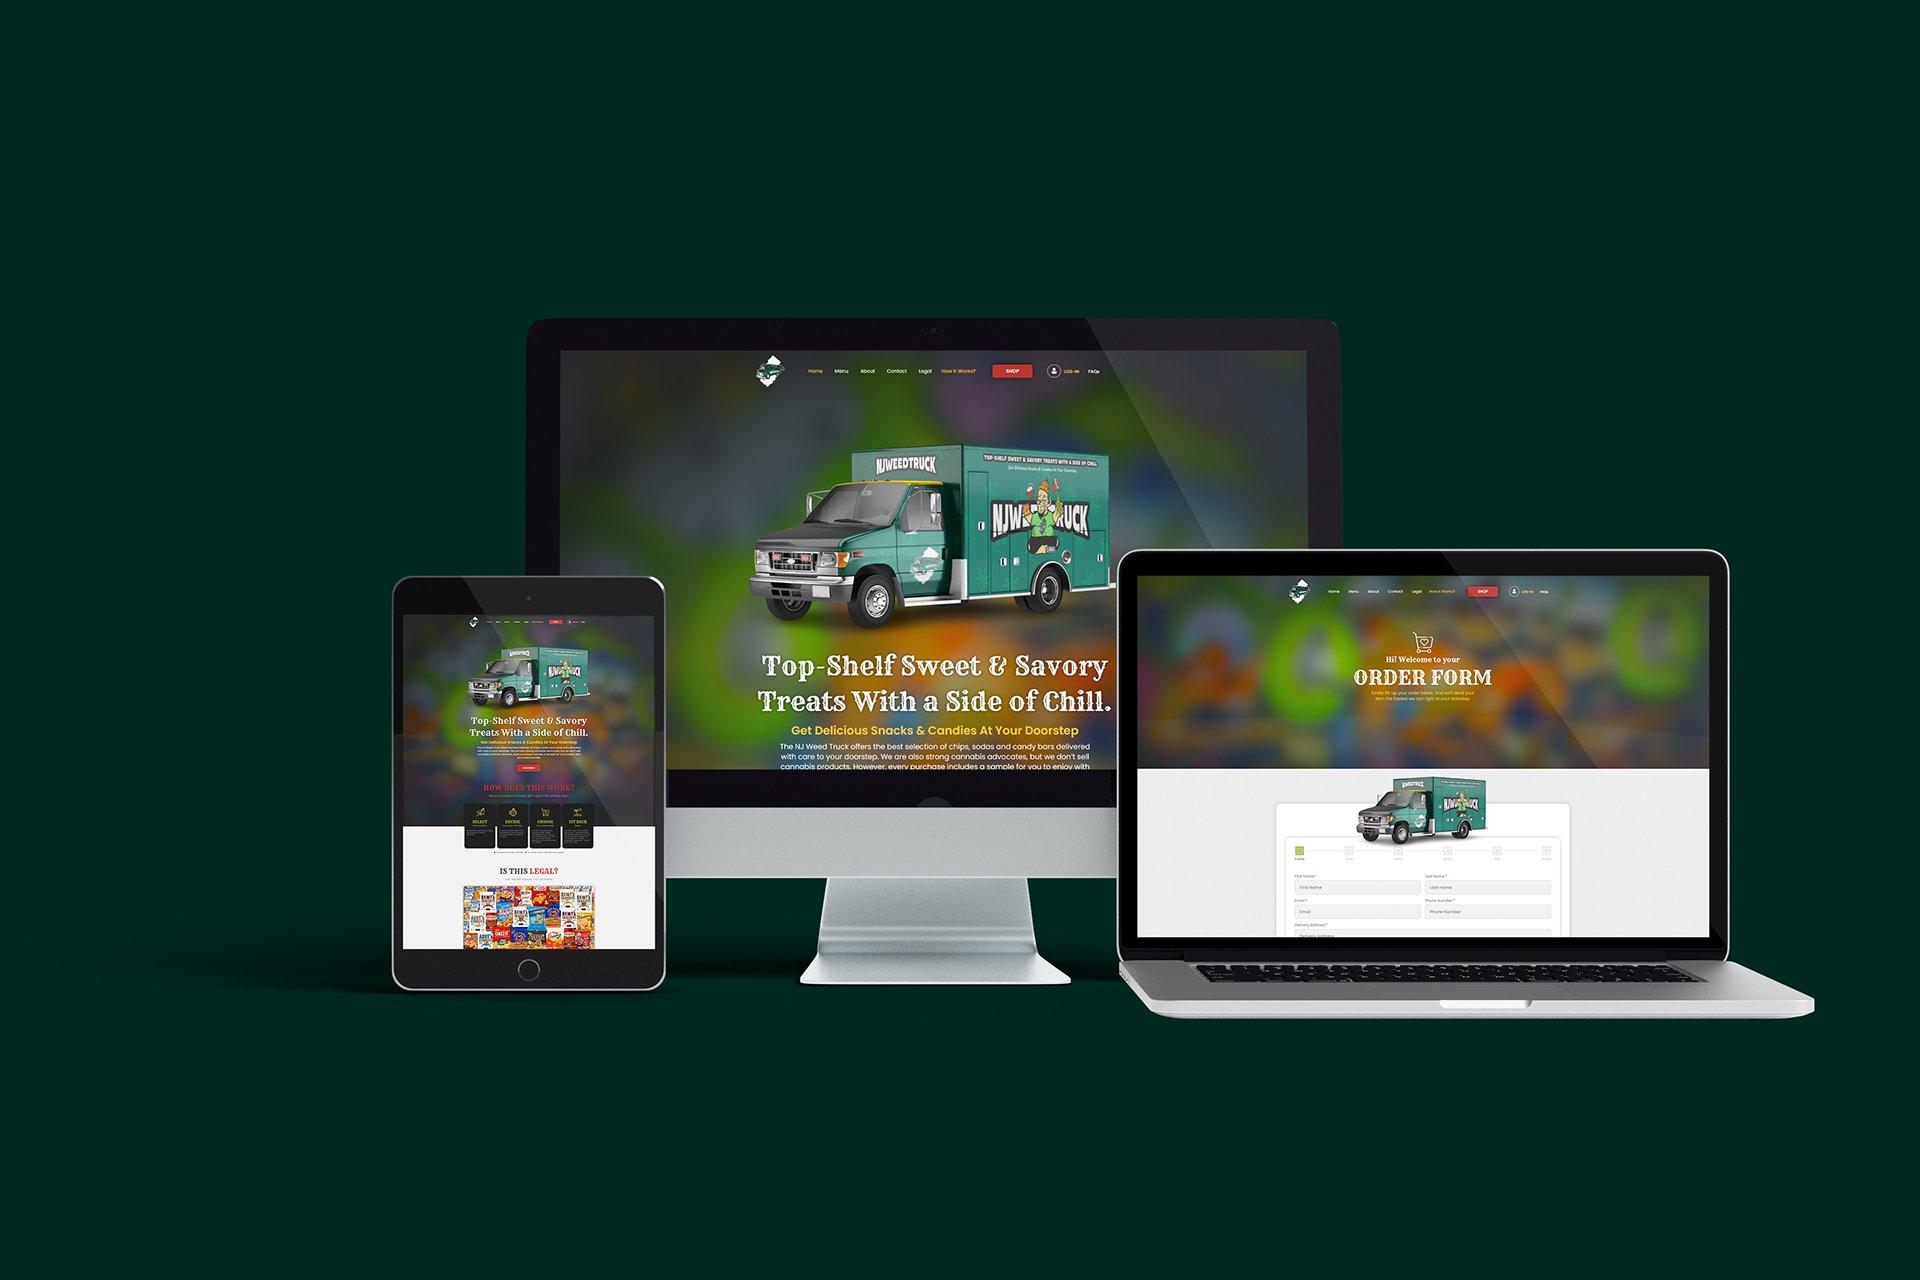 ADAMS_Project_NJ_Weed_Truck_3